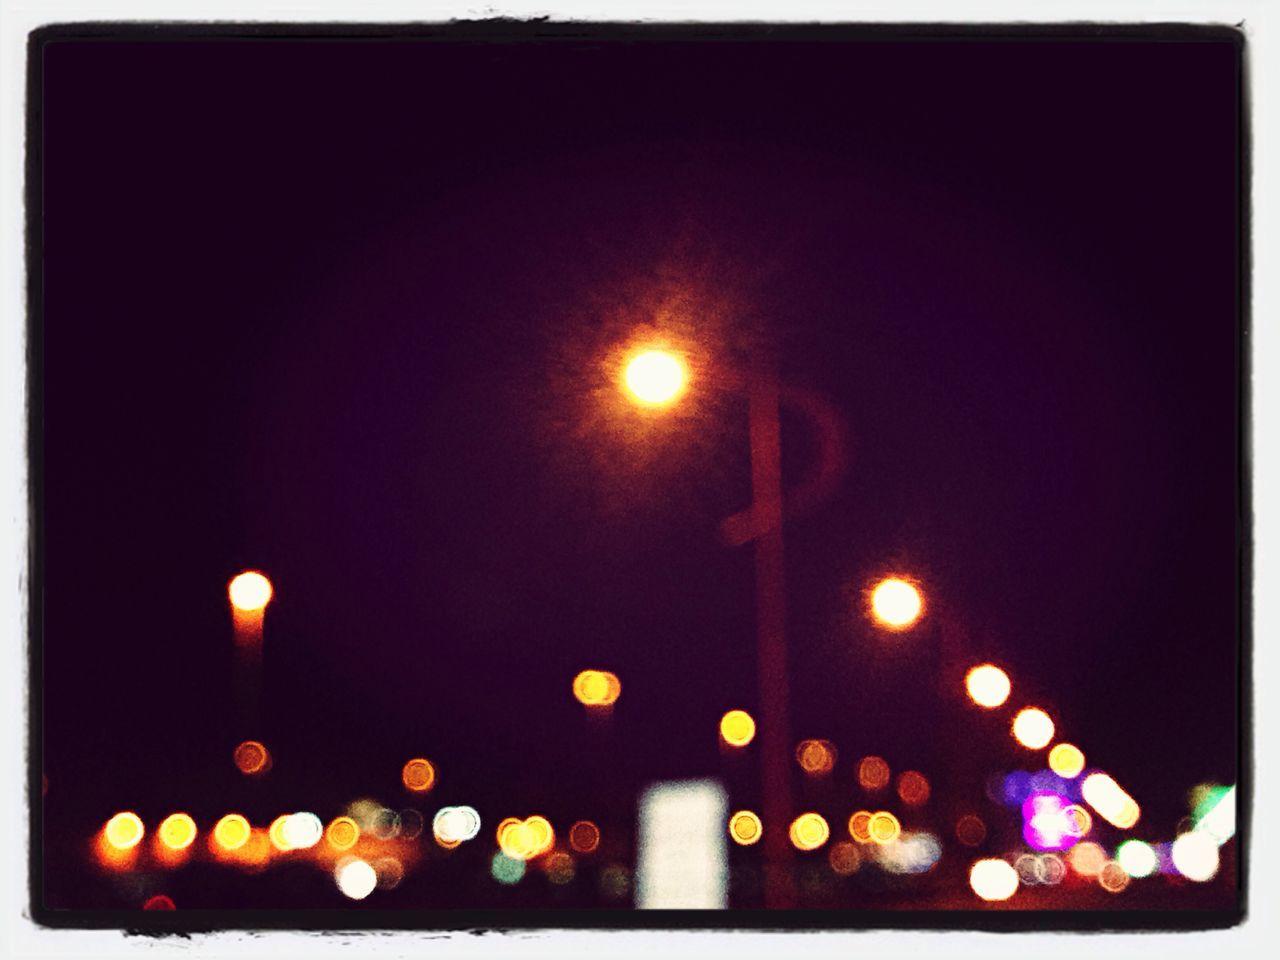 Night lights, stress-free moments.